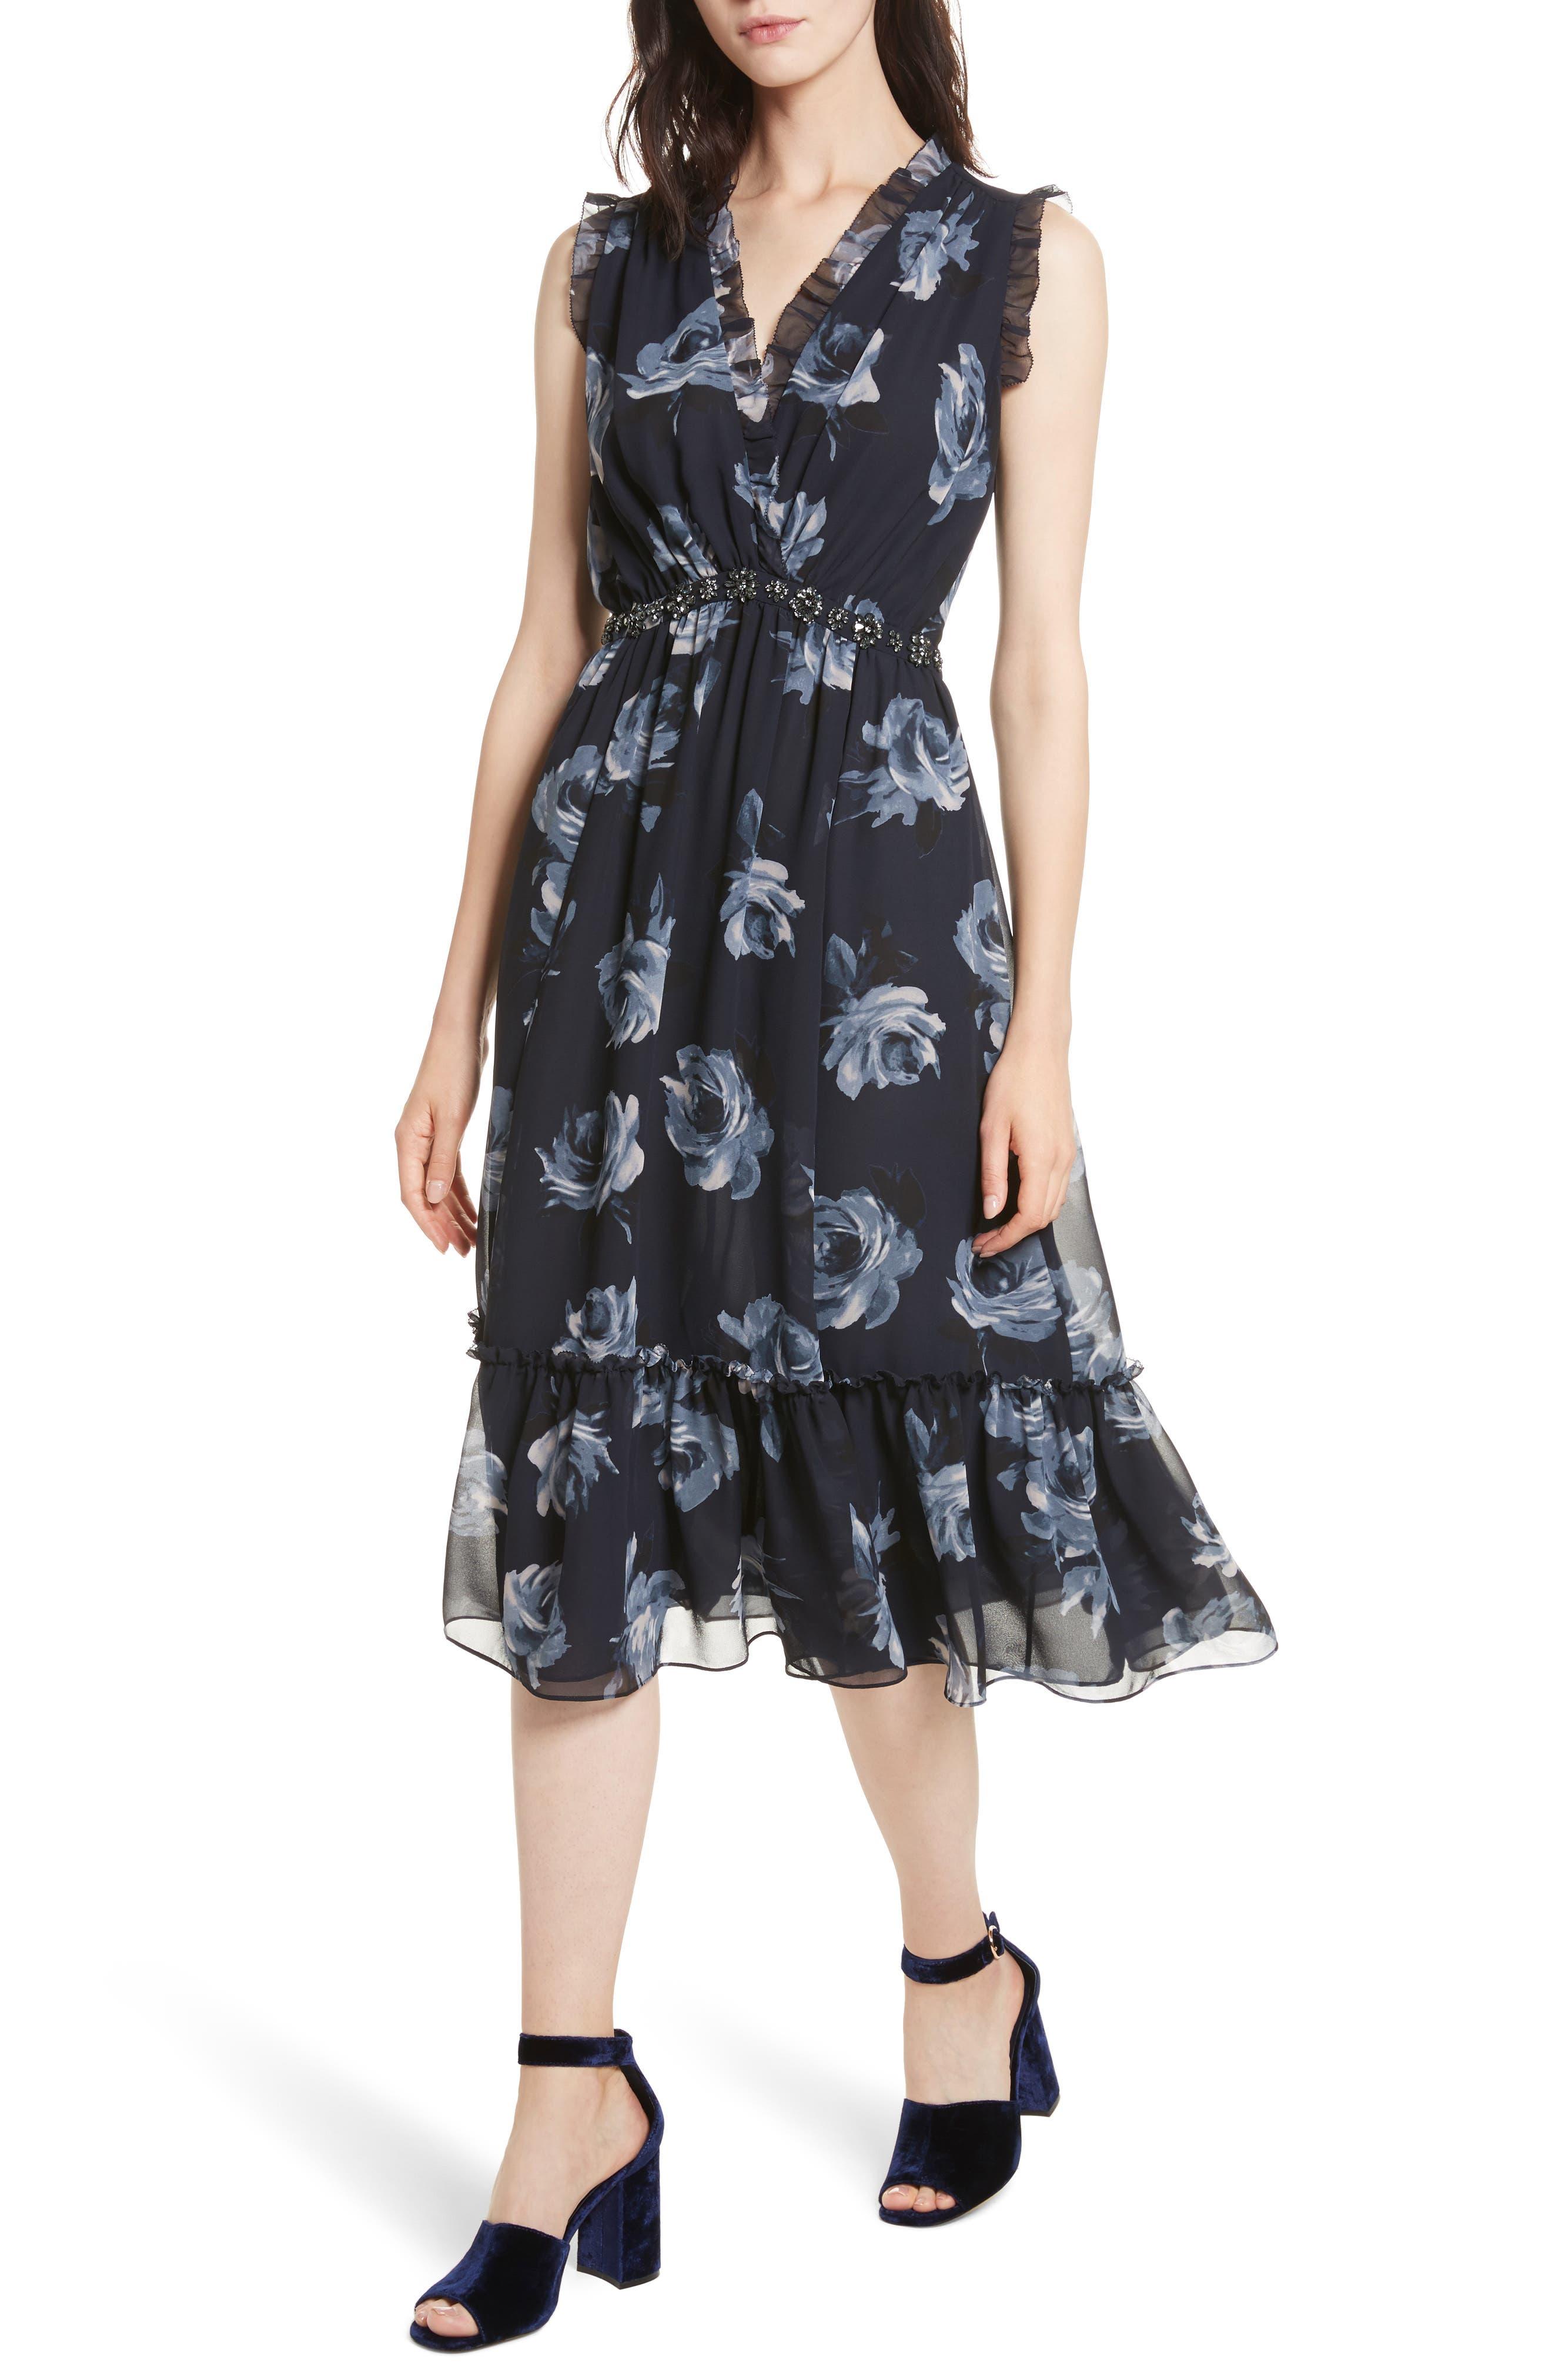 kade spade new york Night Rose Chiffon Midi Dress,                             Alternate thumbnail 4, color,                             Rich Navy